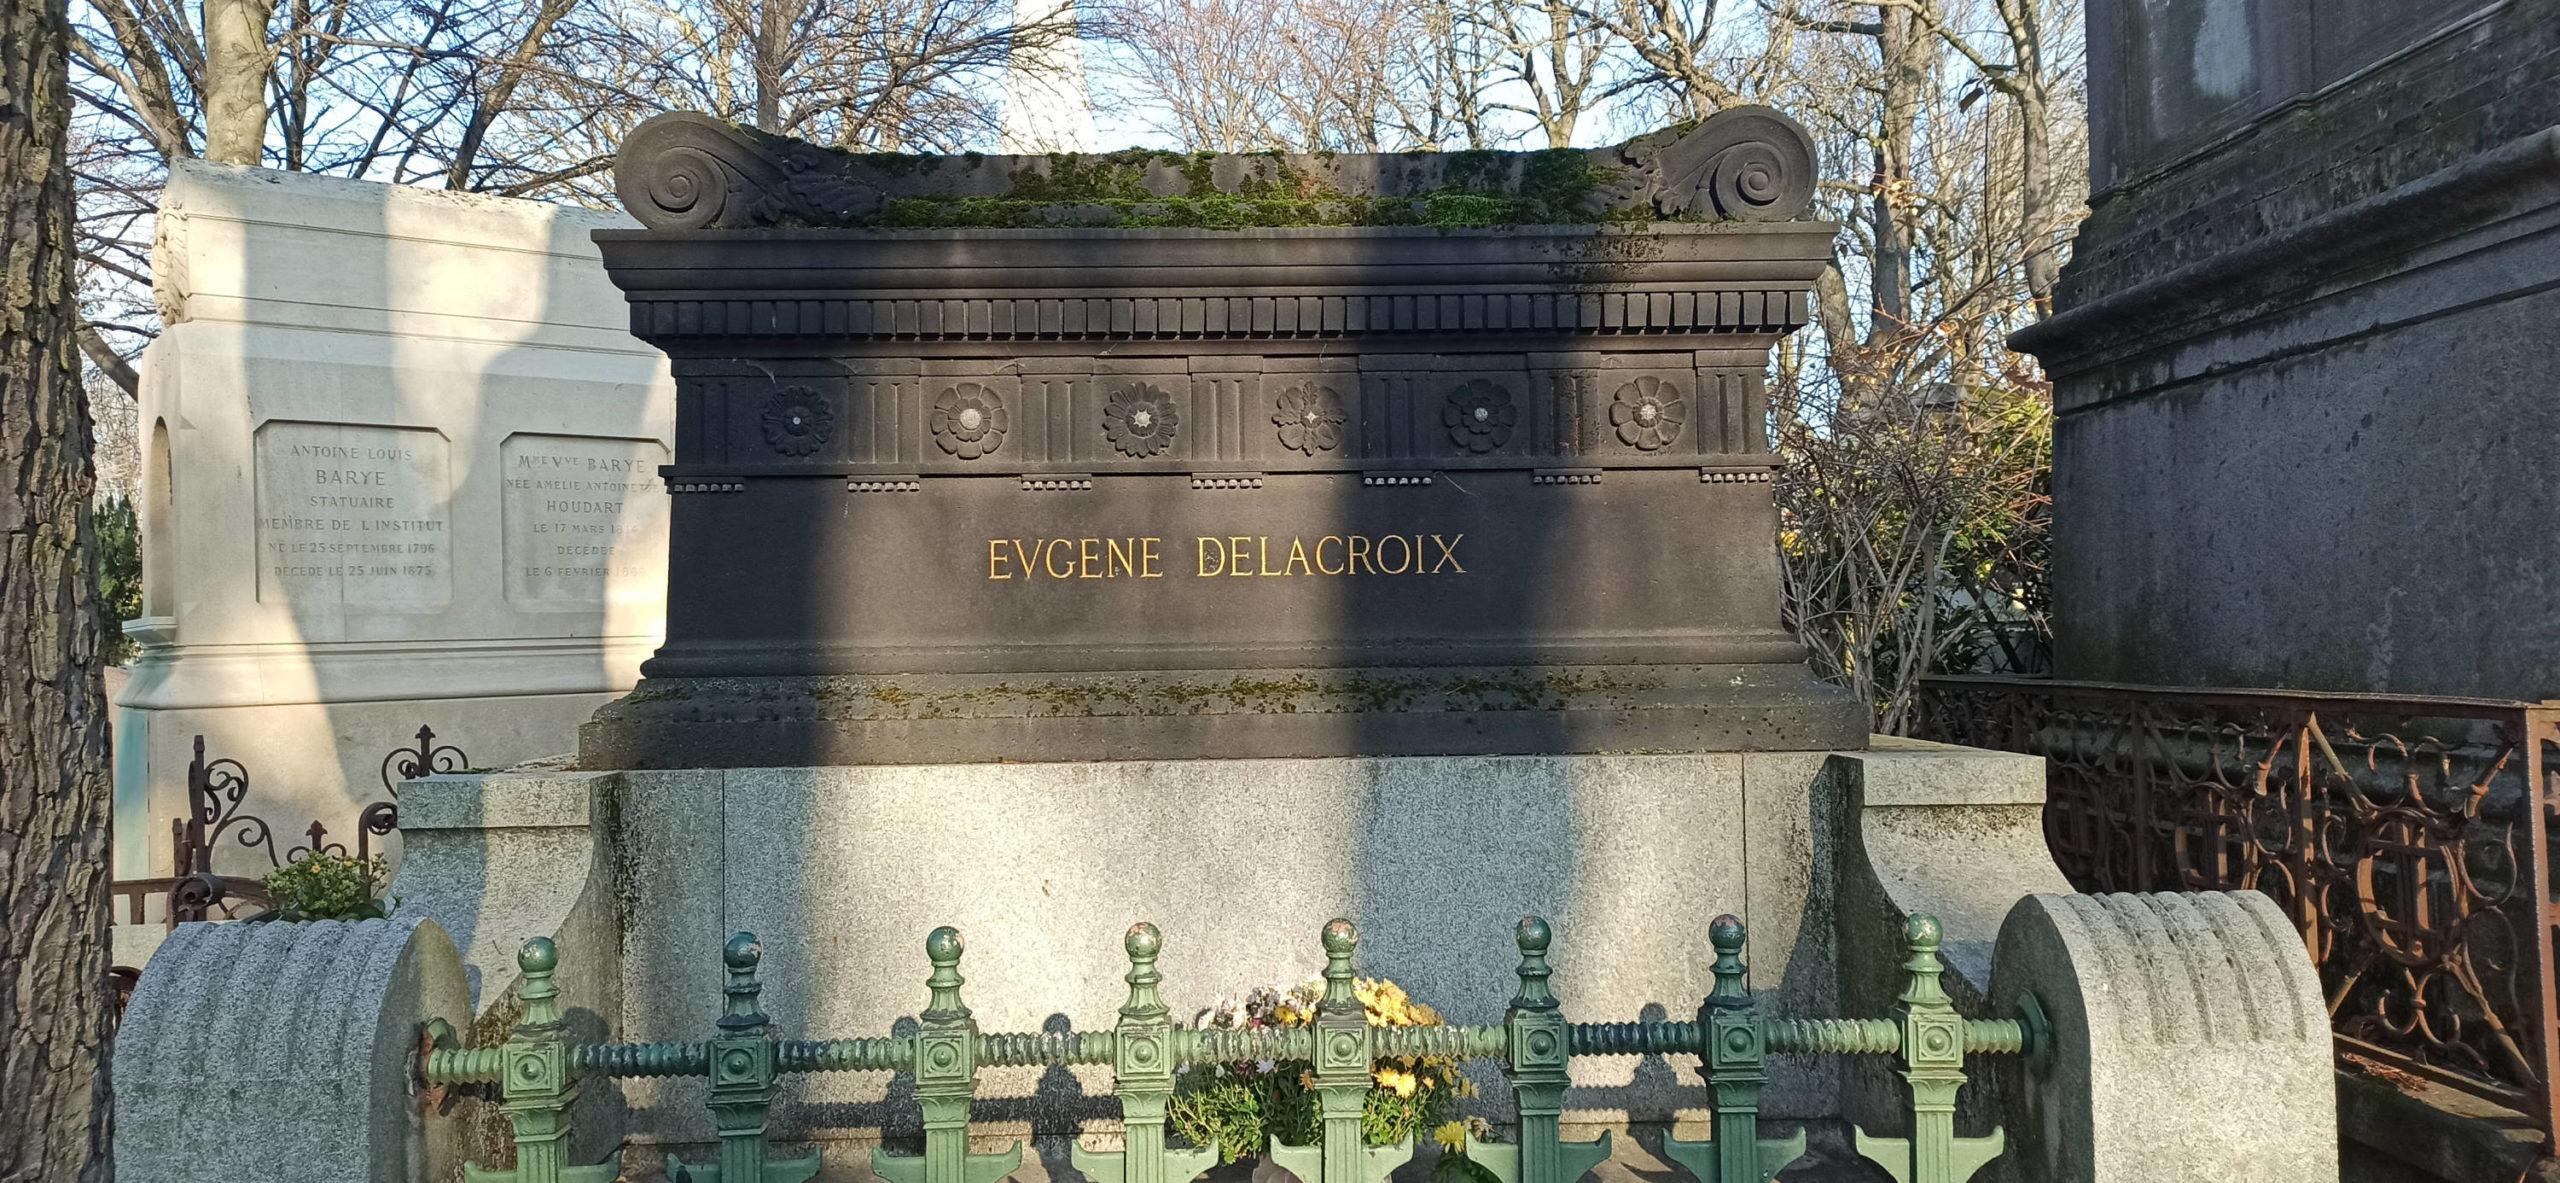 Ежен Делакруа - кладбище Пер Лашез в Париже